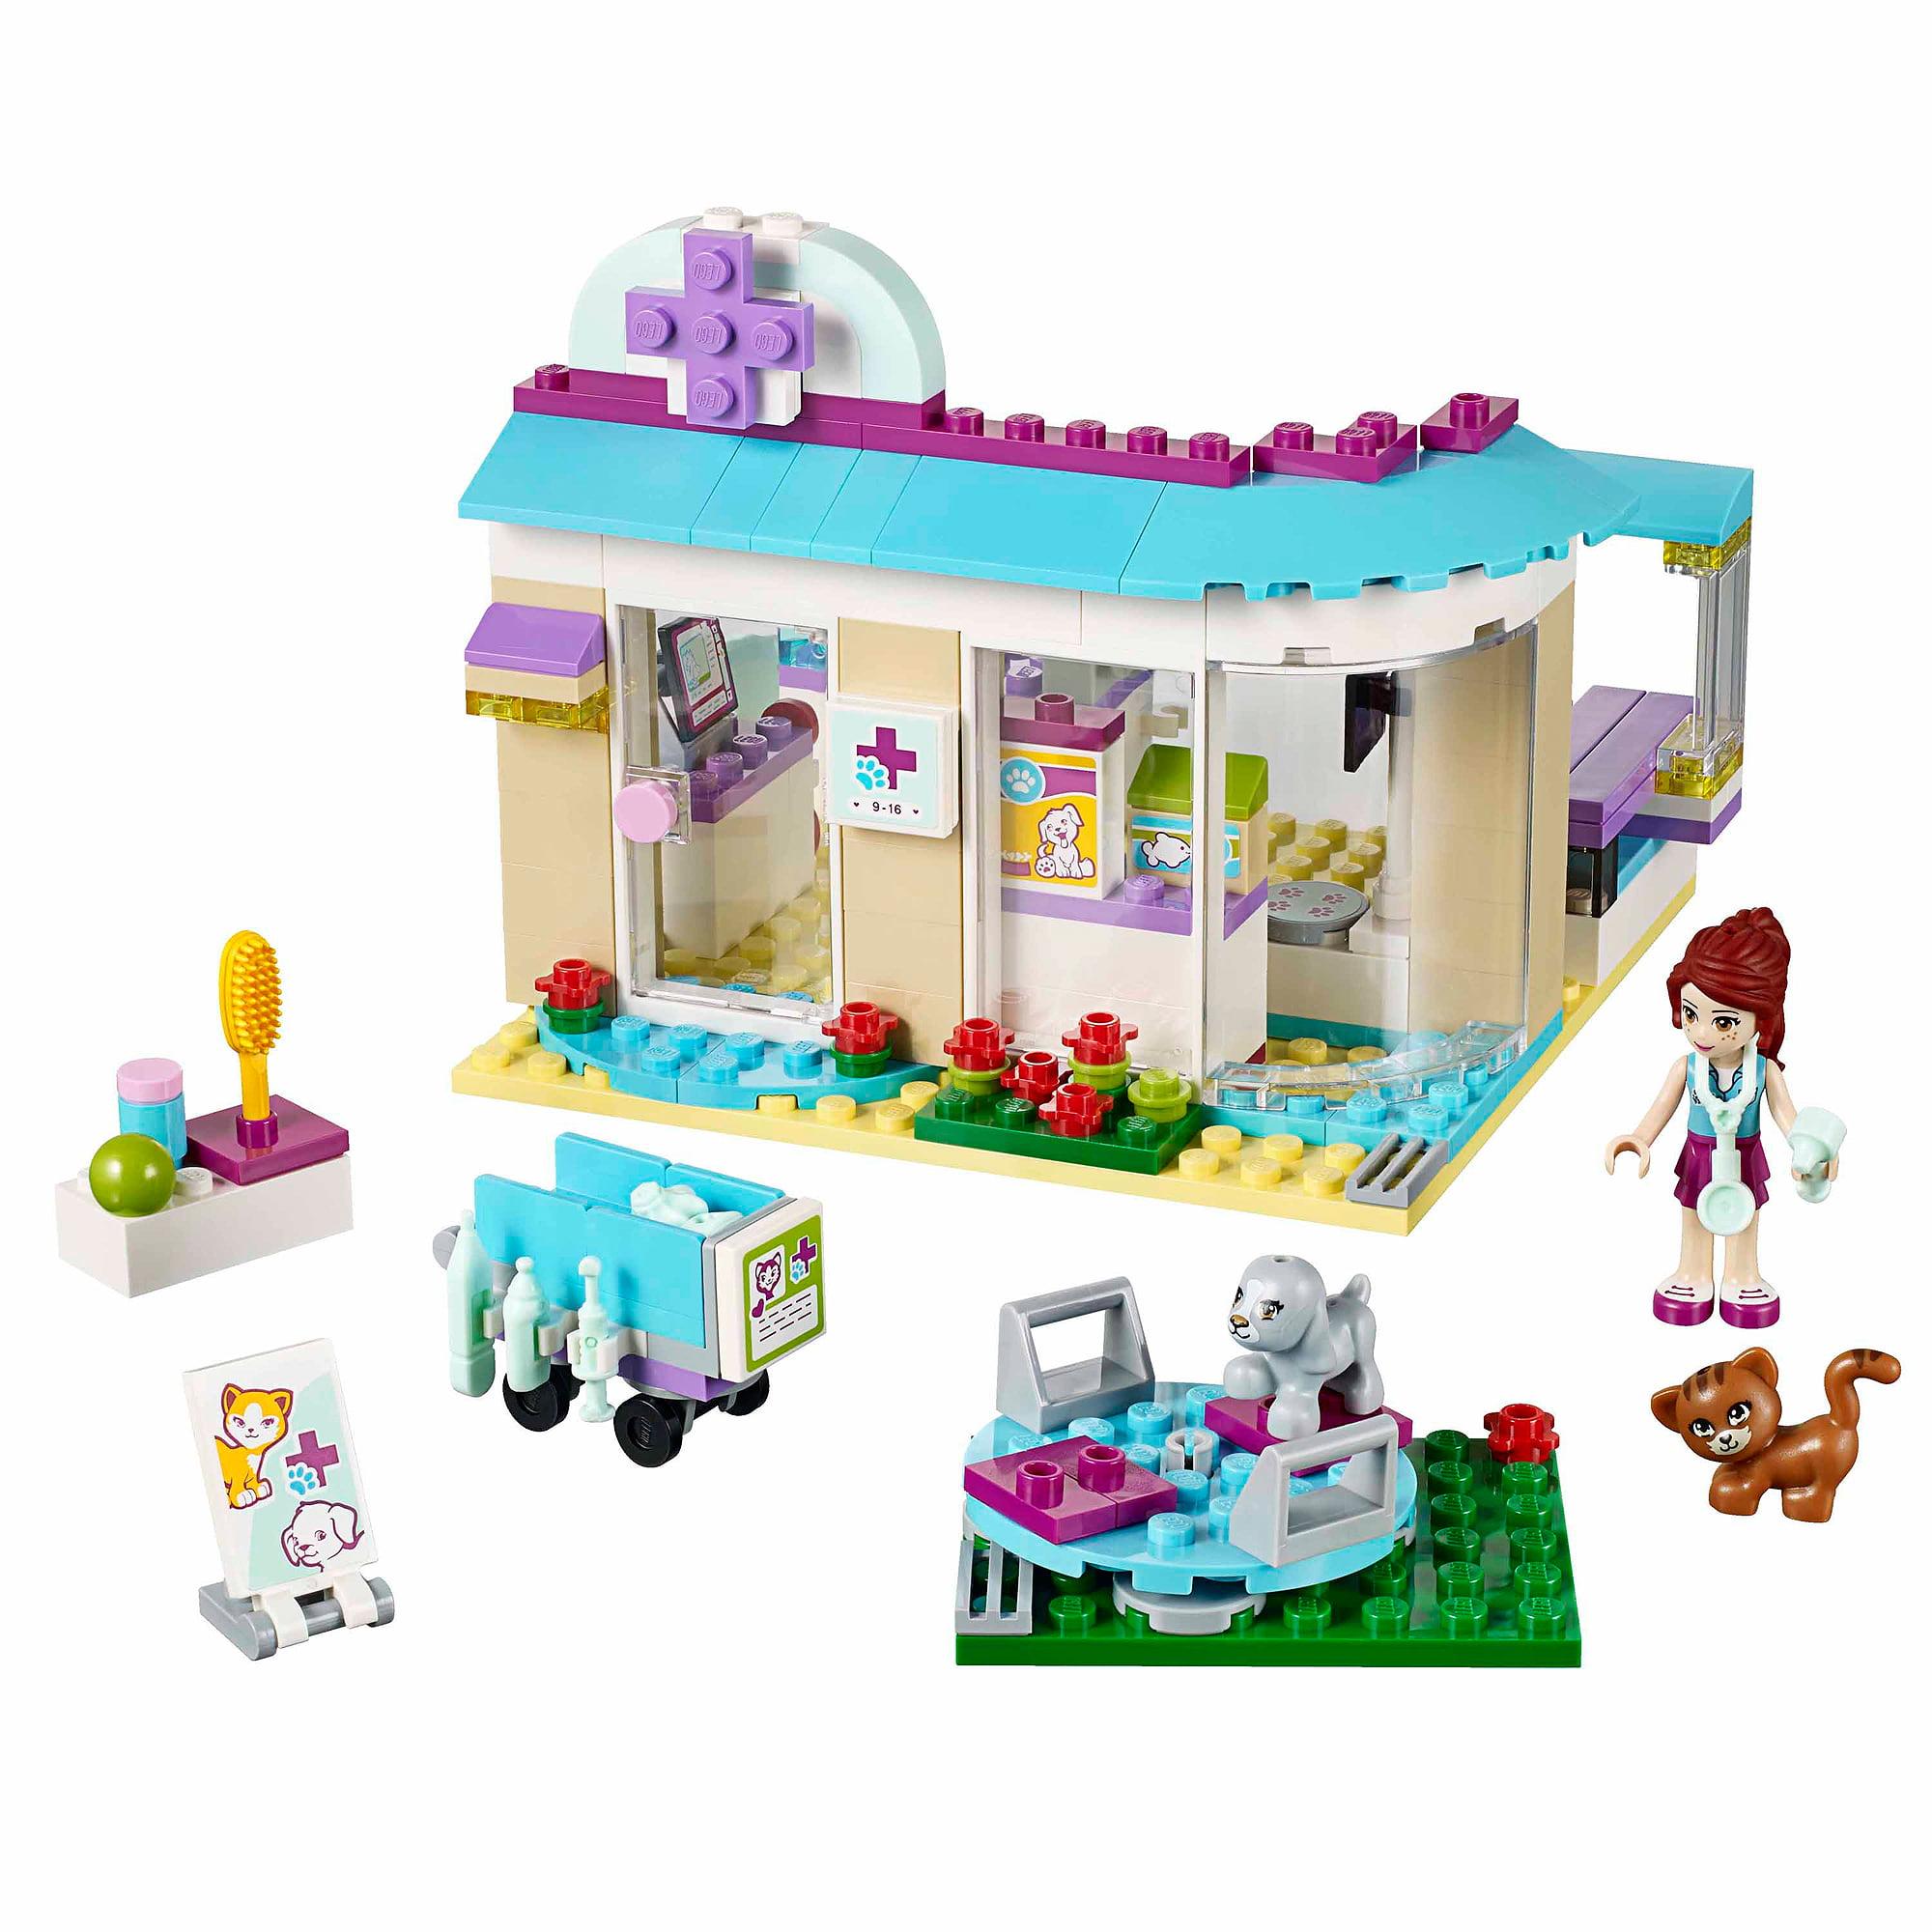 Lego Friends Vet Clinic Walmartcom